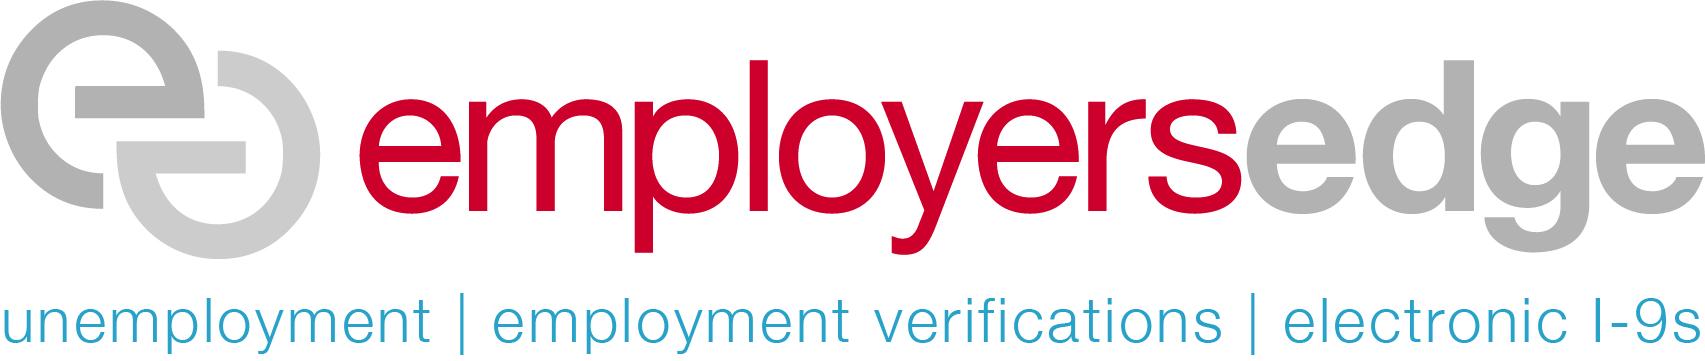 EmployersEdgeLogo.jpg